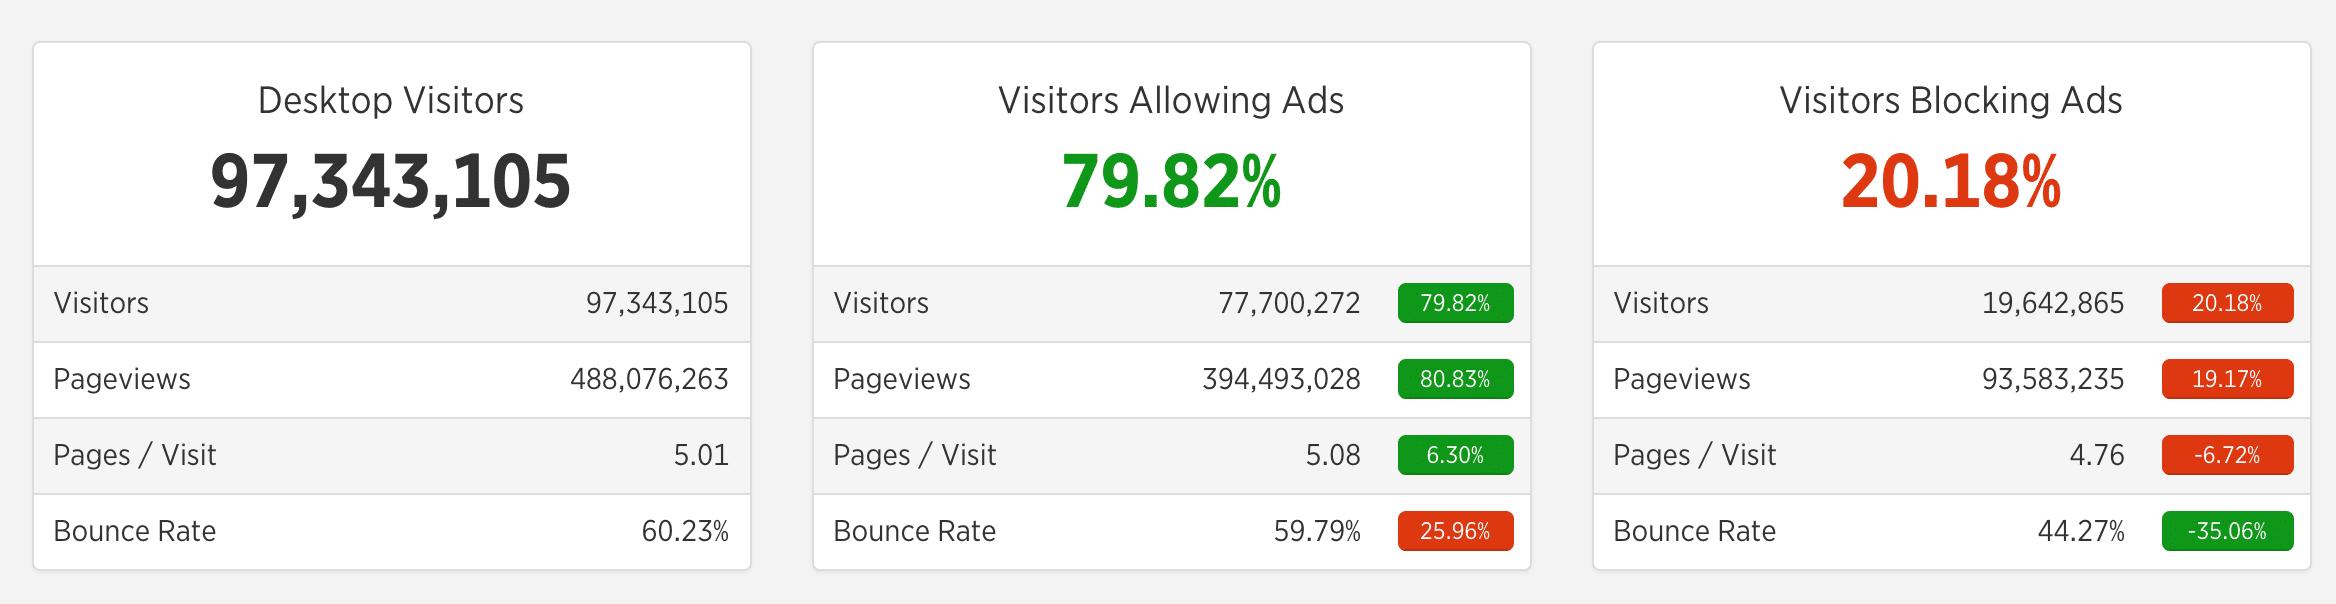 Annonceblokeringsstatistik